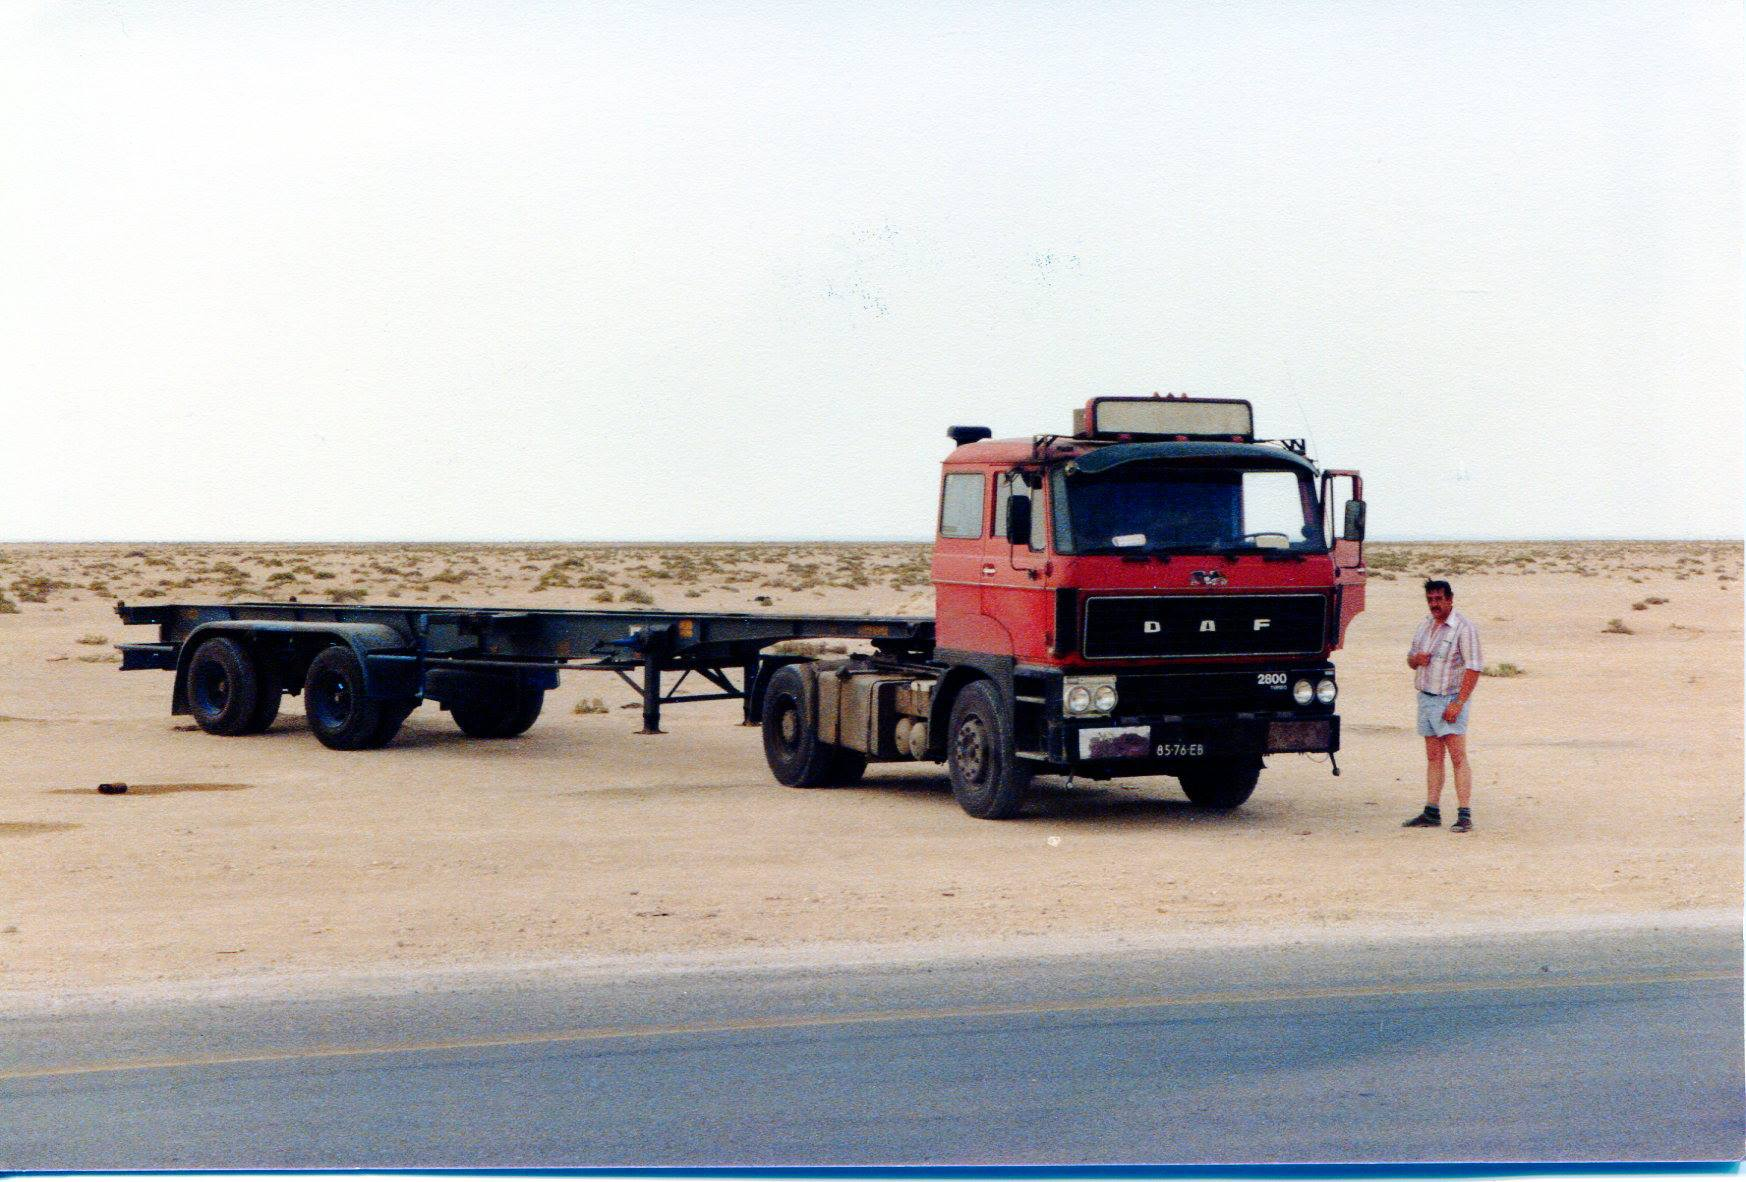 Hans-Anthonise-midden-oosten-transport-22